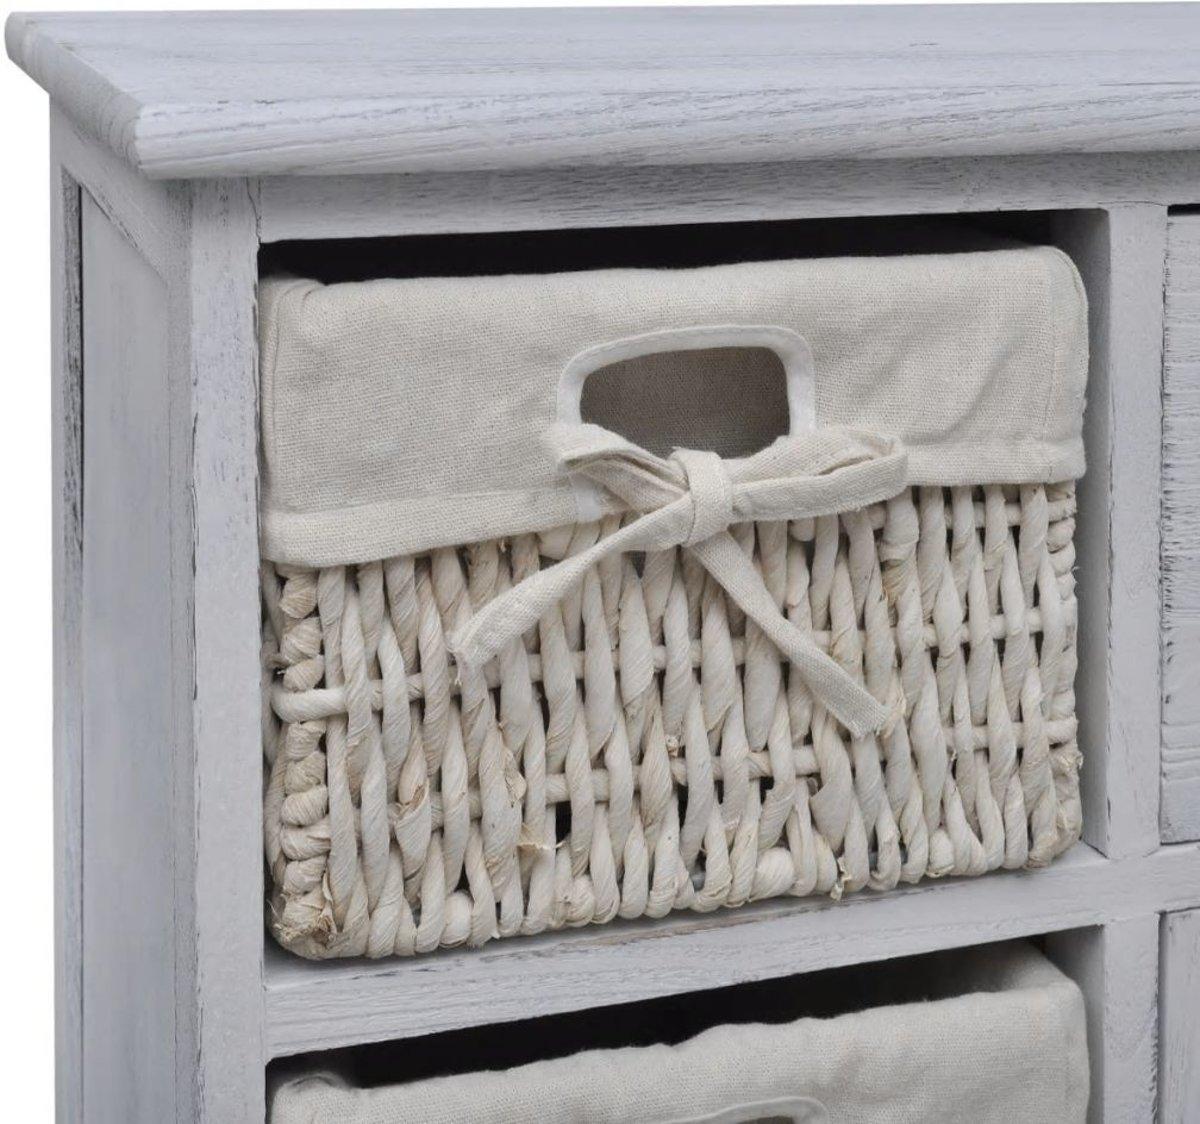 Kast Met Mandjes : Bol vidaxl opbergkast met rattan manden hout wit